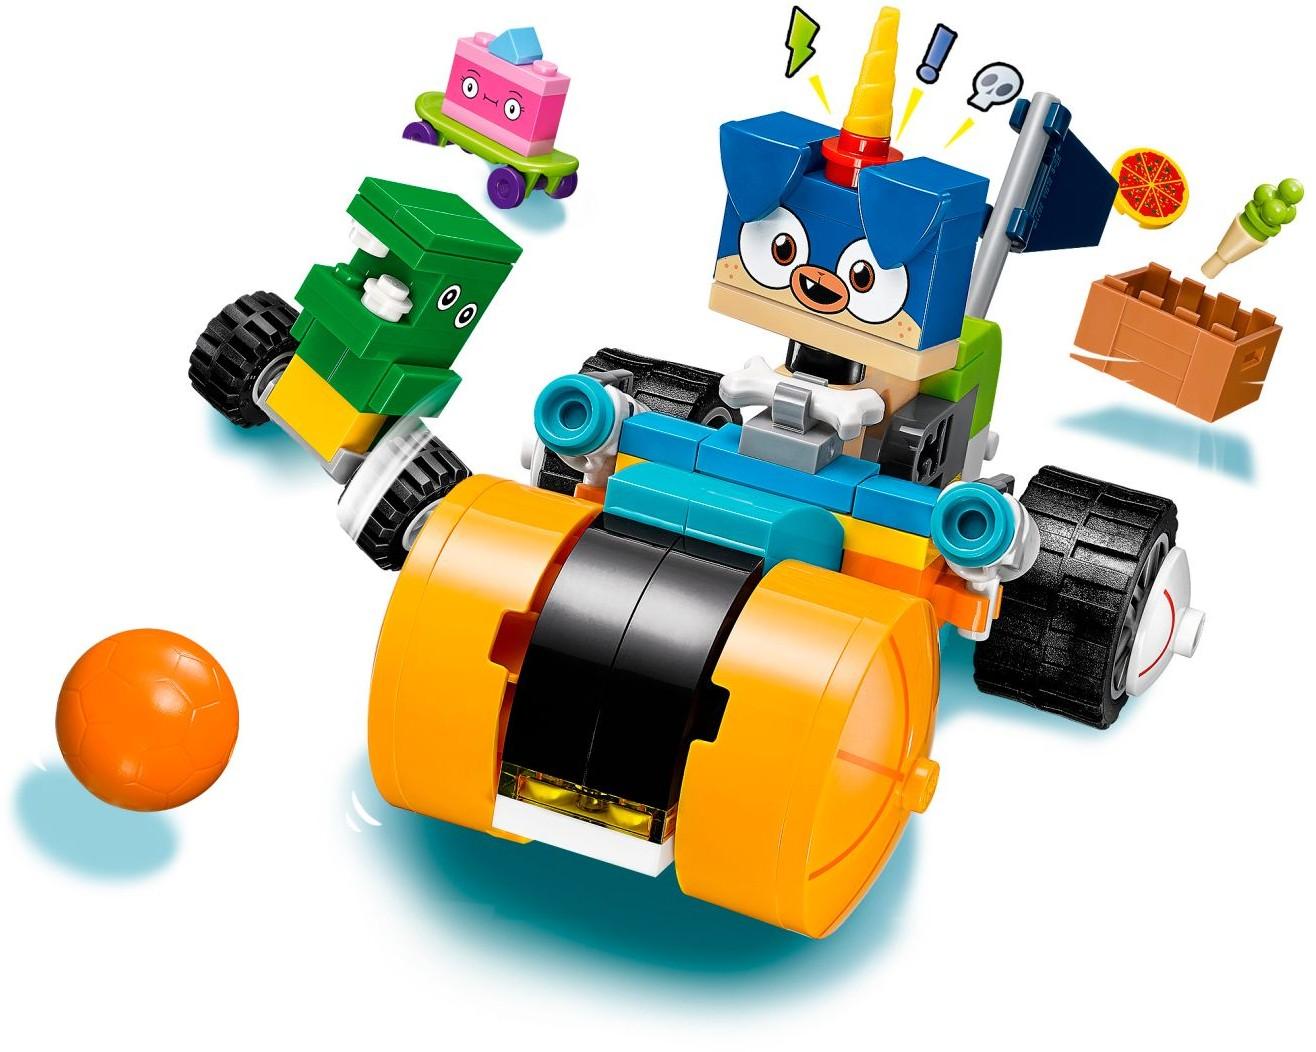 41452 LEGO Unikitty Prince Puppycorn Trike